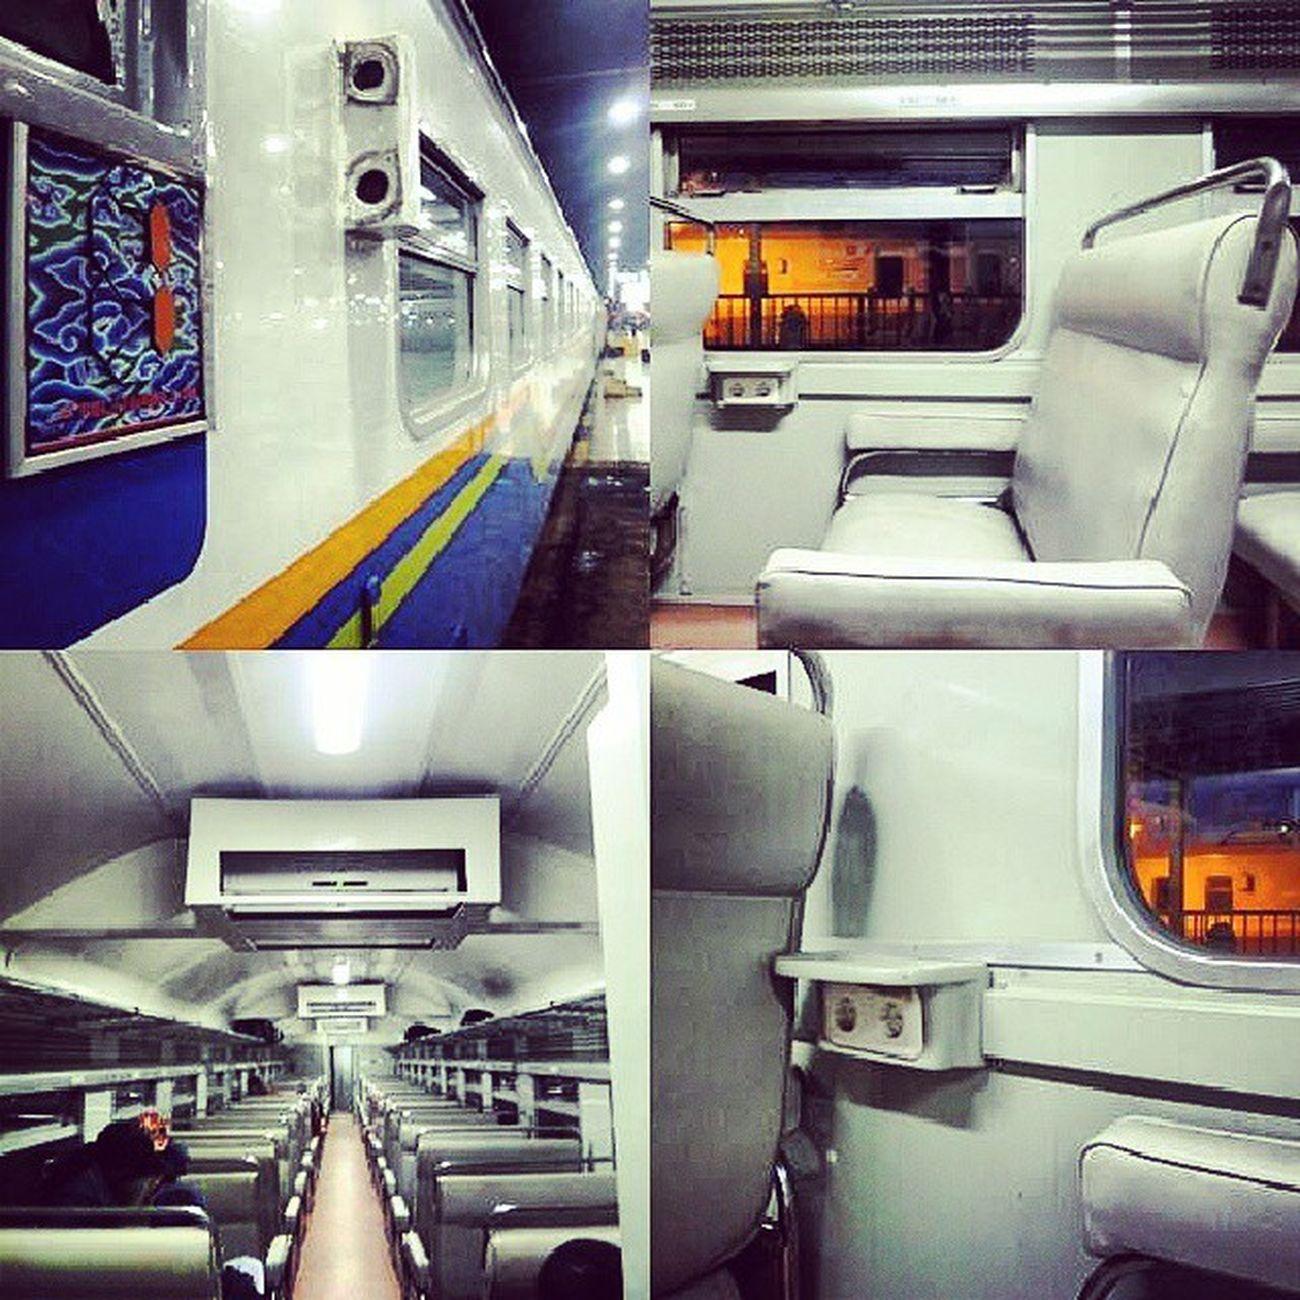 Interior K2 Ciremai Ekspress BD-CN Railfans Daop2 Interior Instadroid instalike like bandung fadever igers